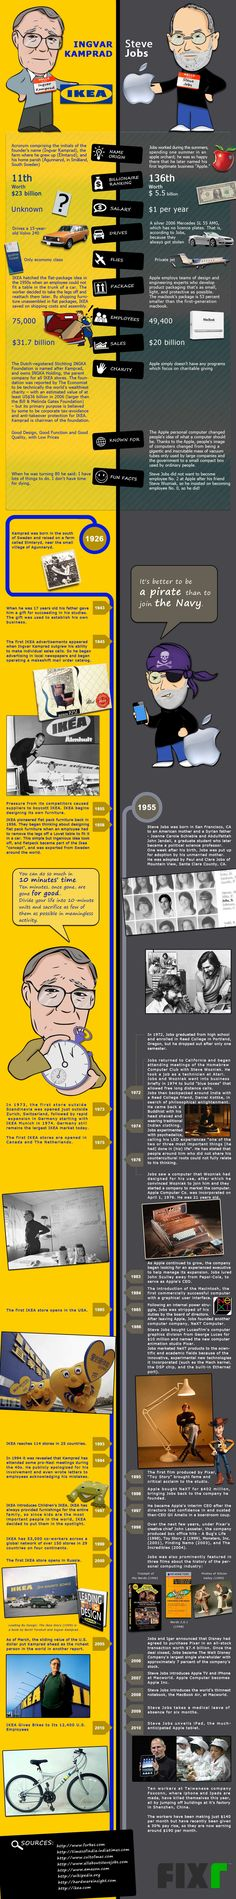 IKEA (Ingvar Kamprad) vs. Apple (Steve Jobs) #infographic